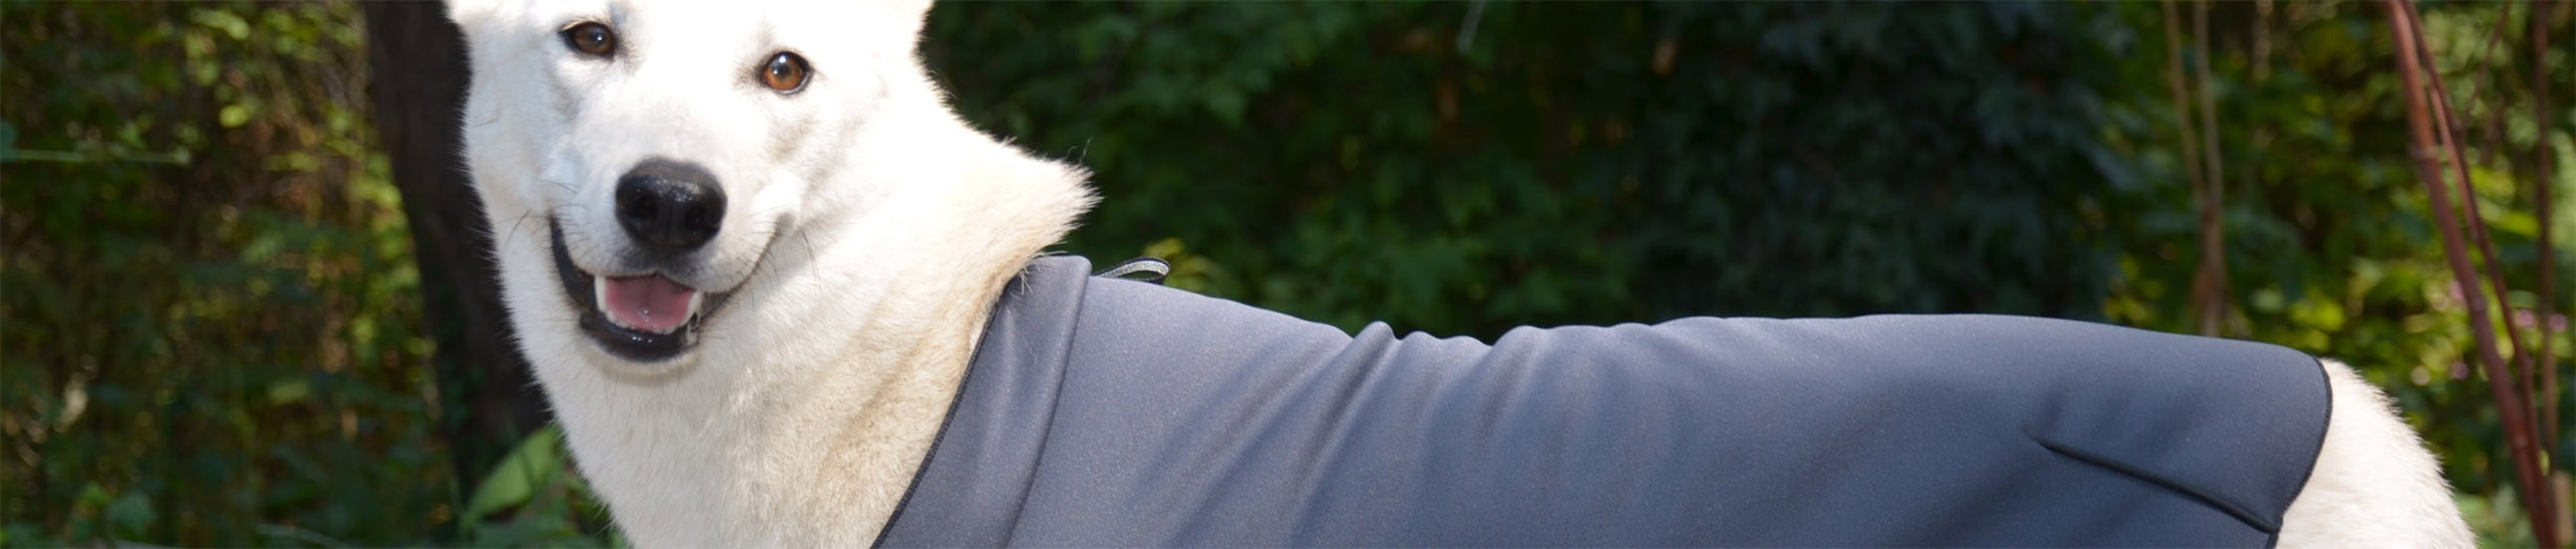 Waterproof Breathable Softshell Dog Coat